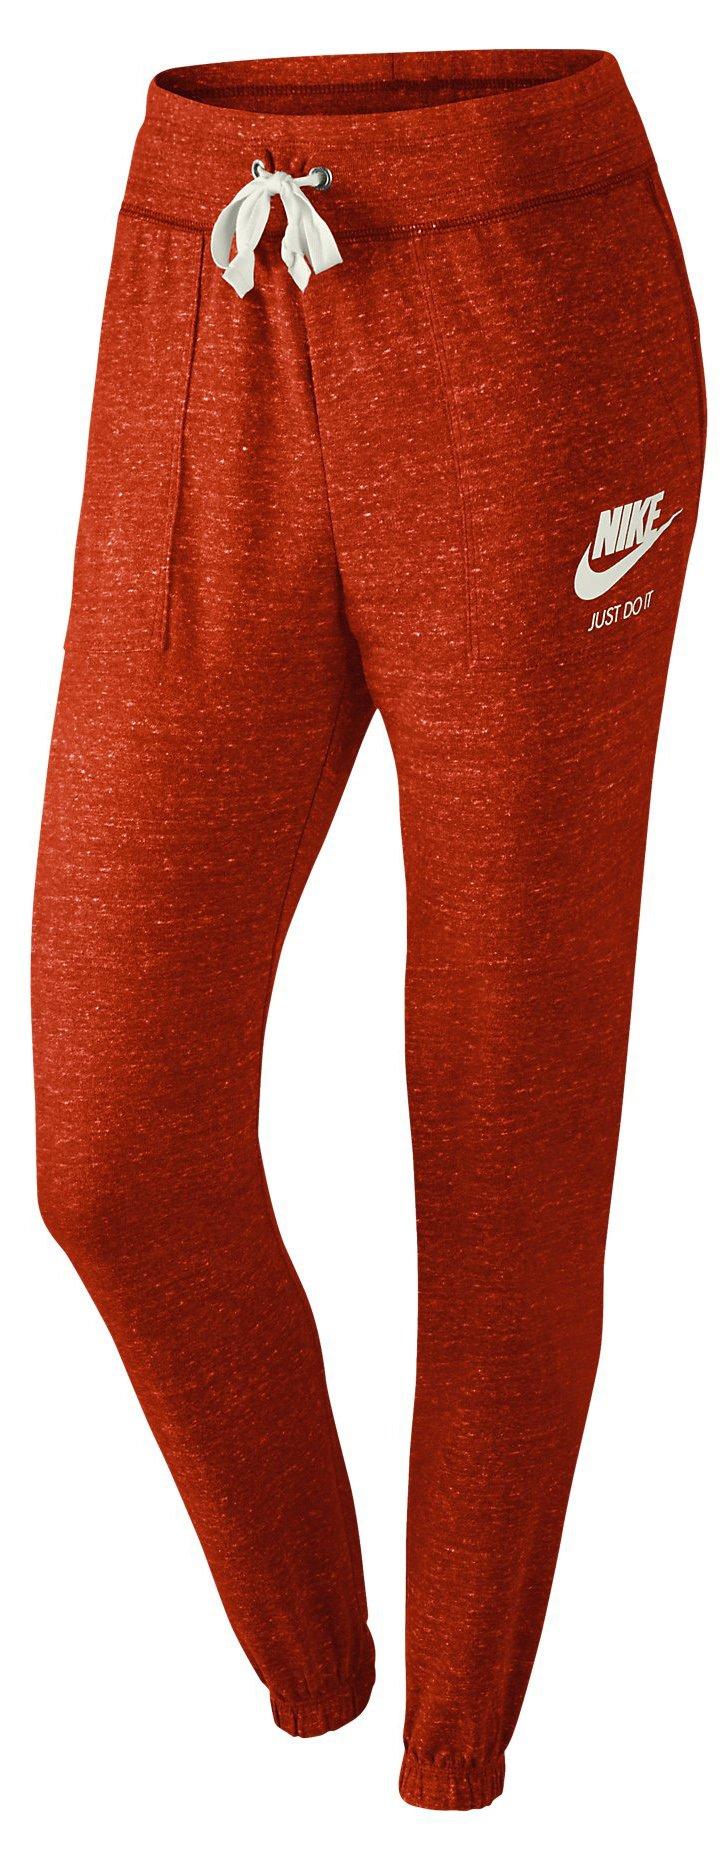 Kalhoty Nike Gym Vintage